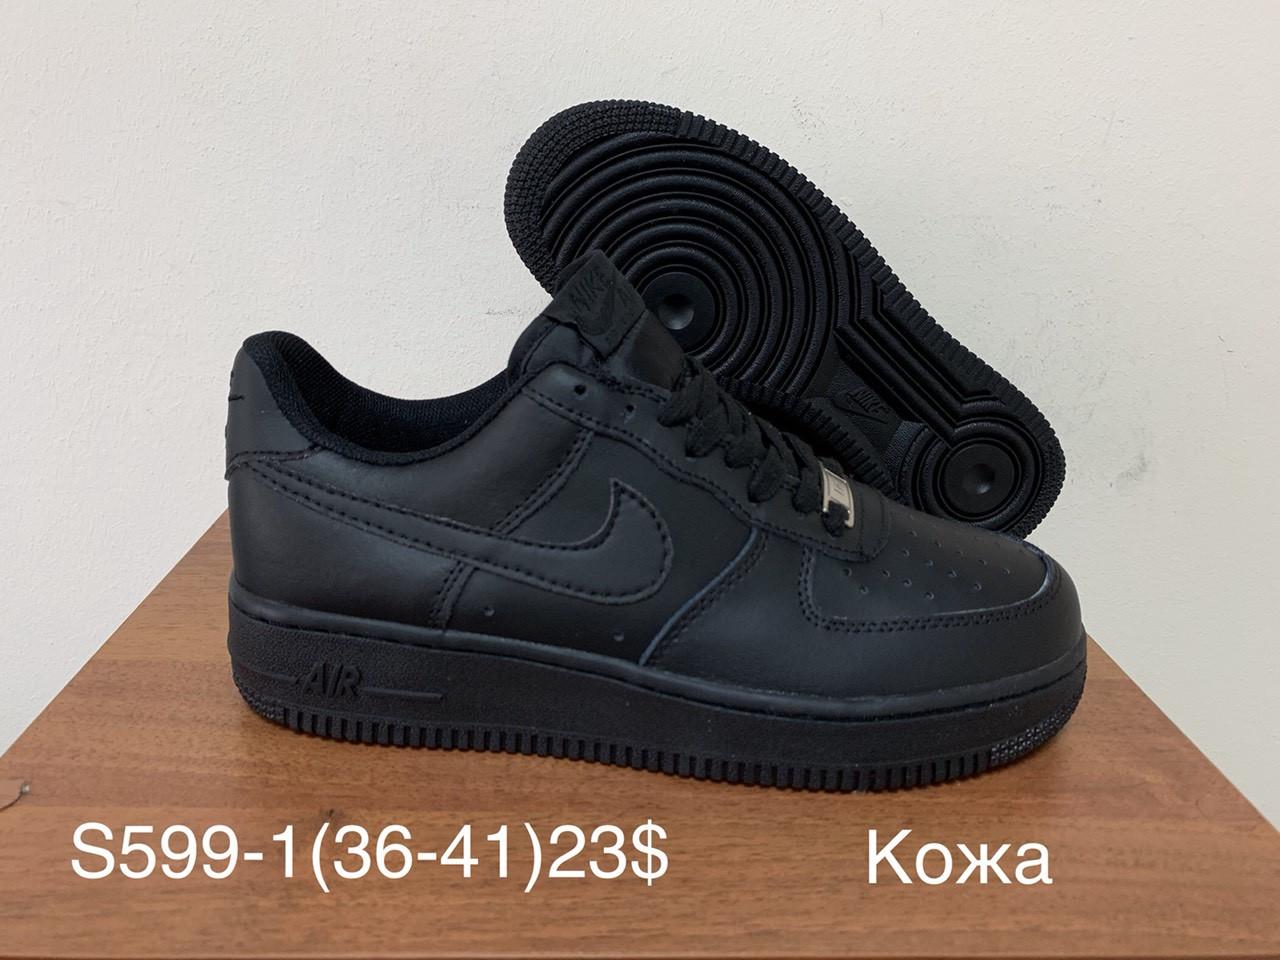 Кроссовки подросток Nike Air Force оптом (36-41)